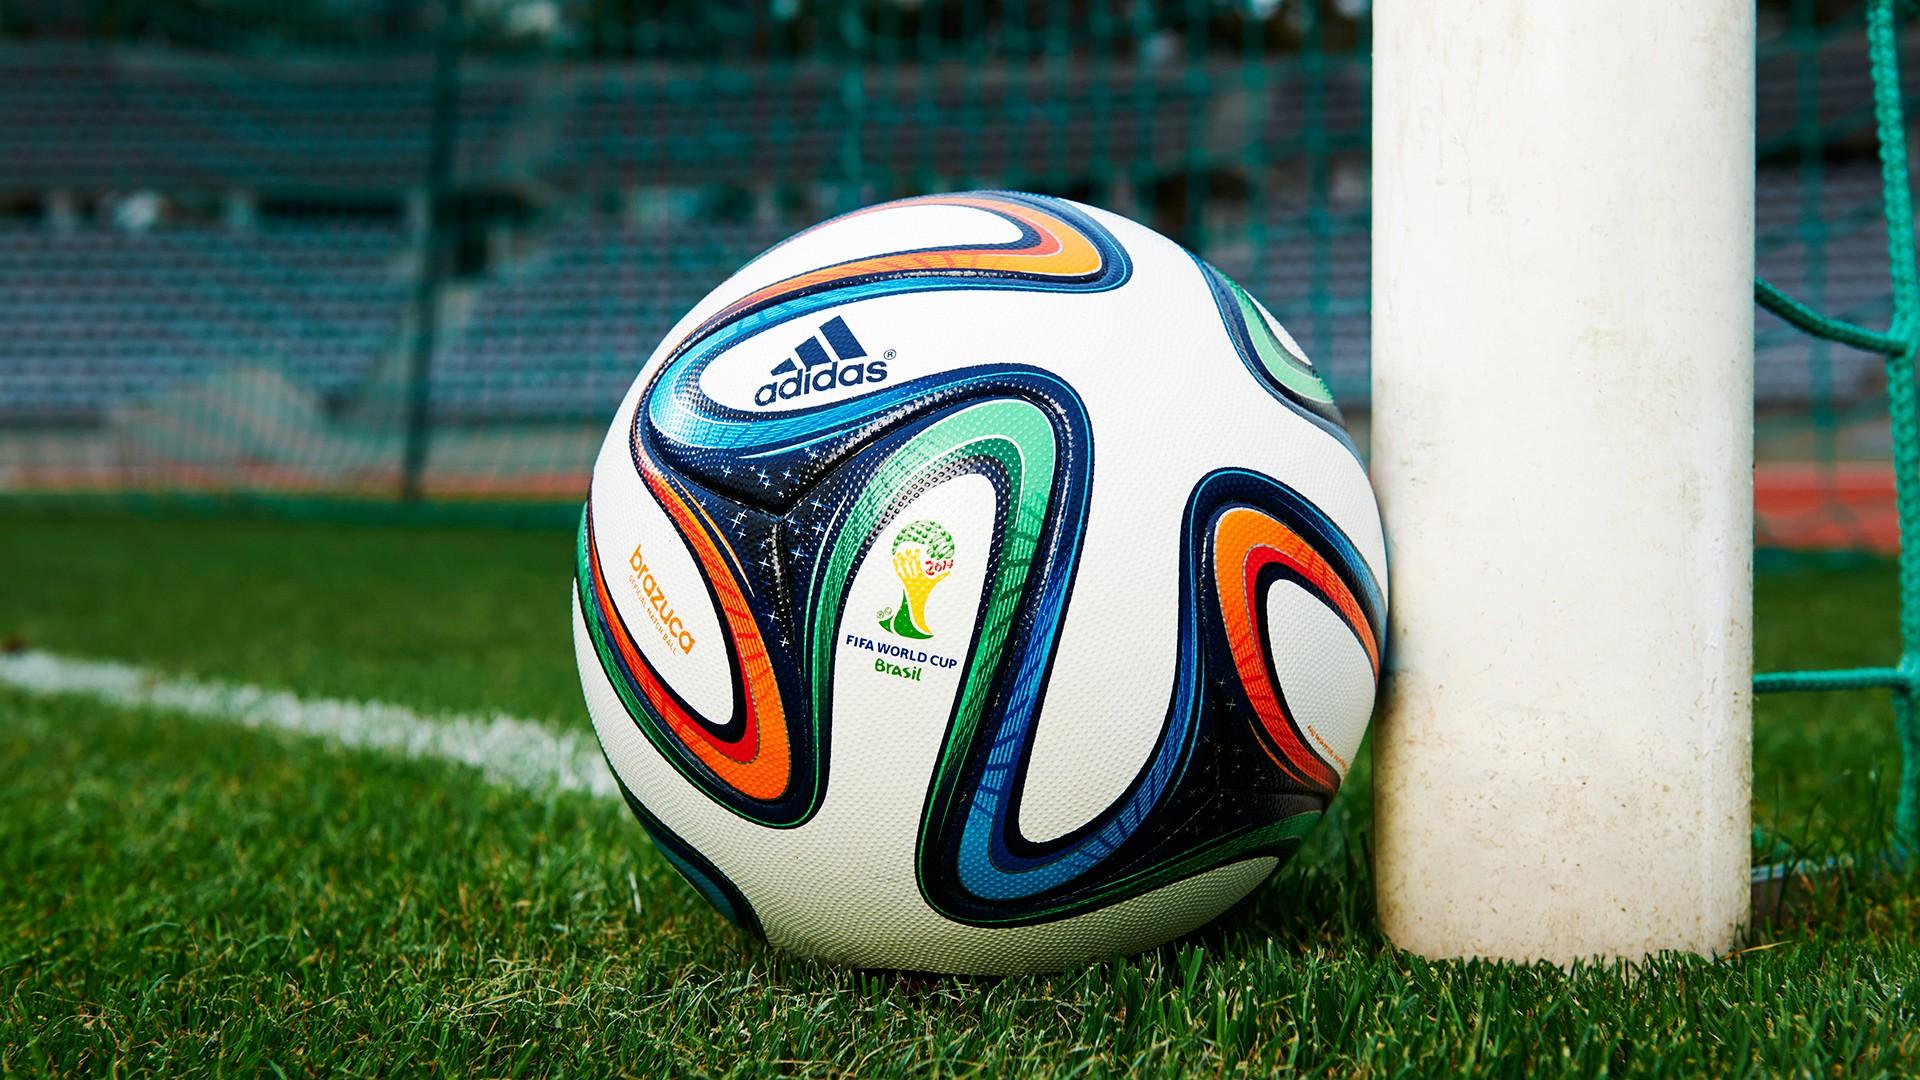 2048x1152 fifa world cup brasil 2048x1152 resolution hd 4k